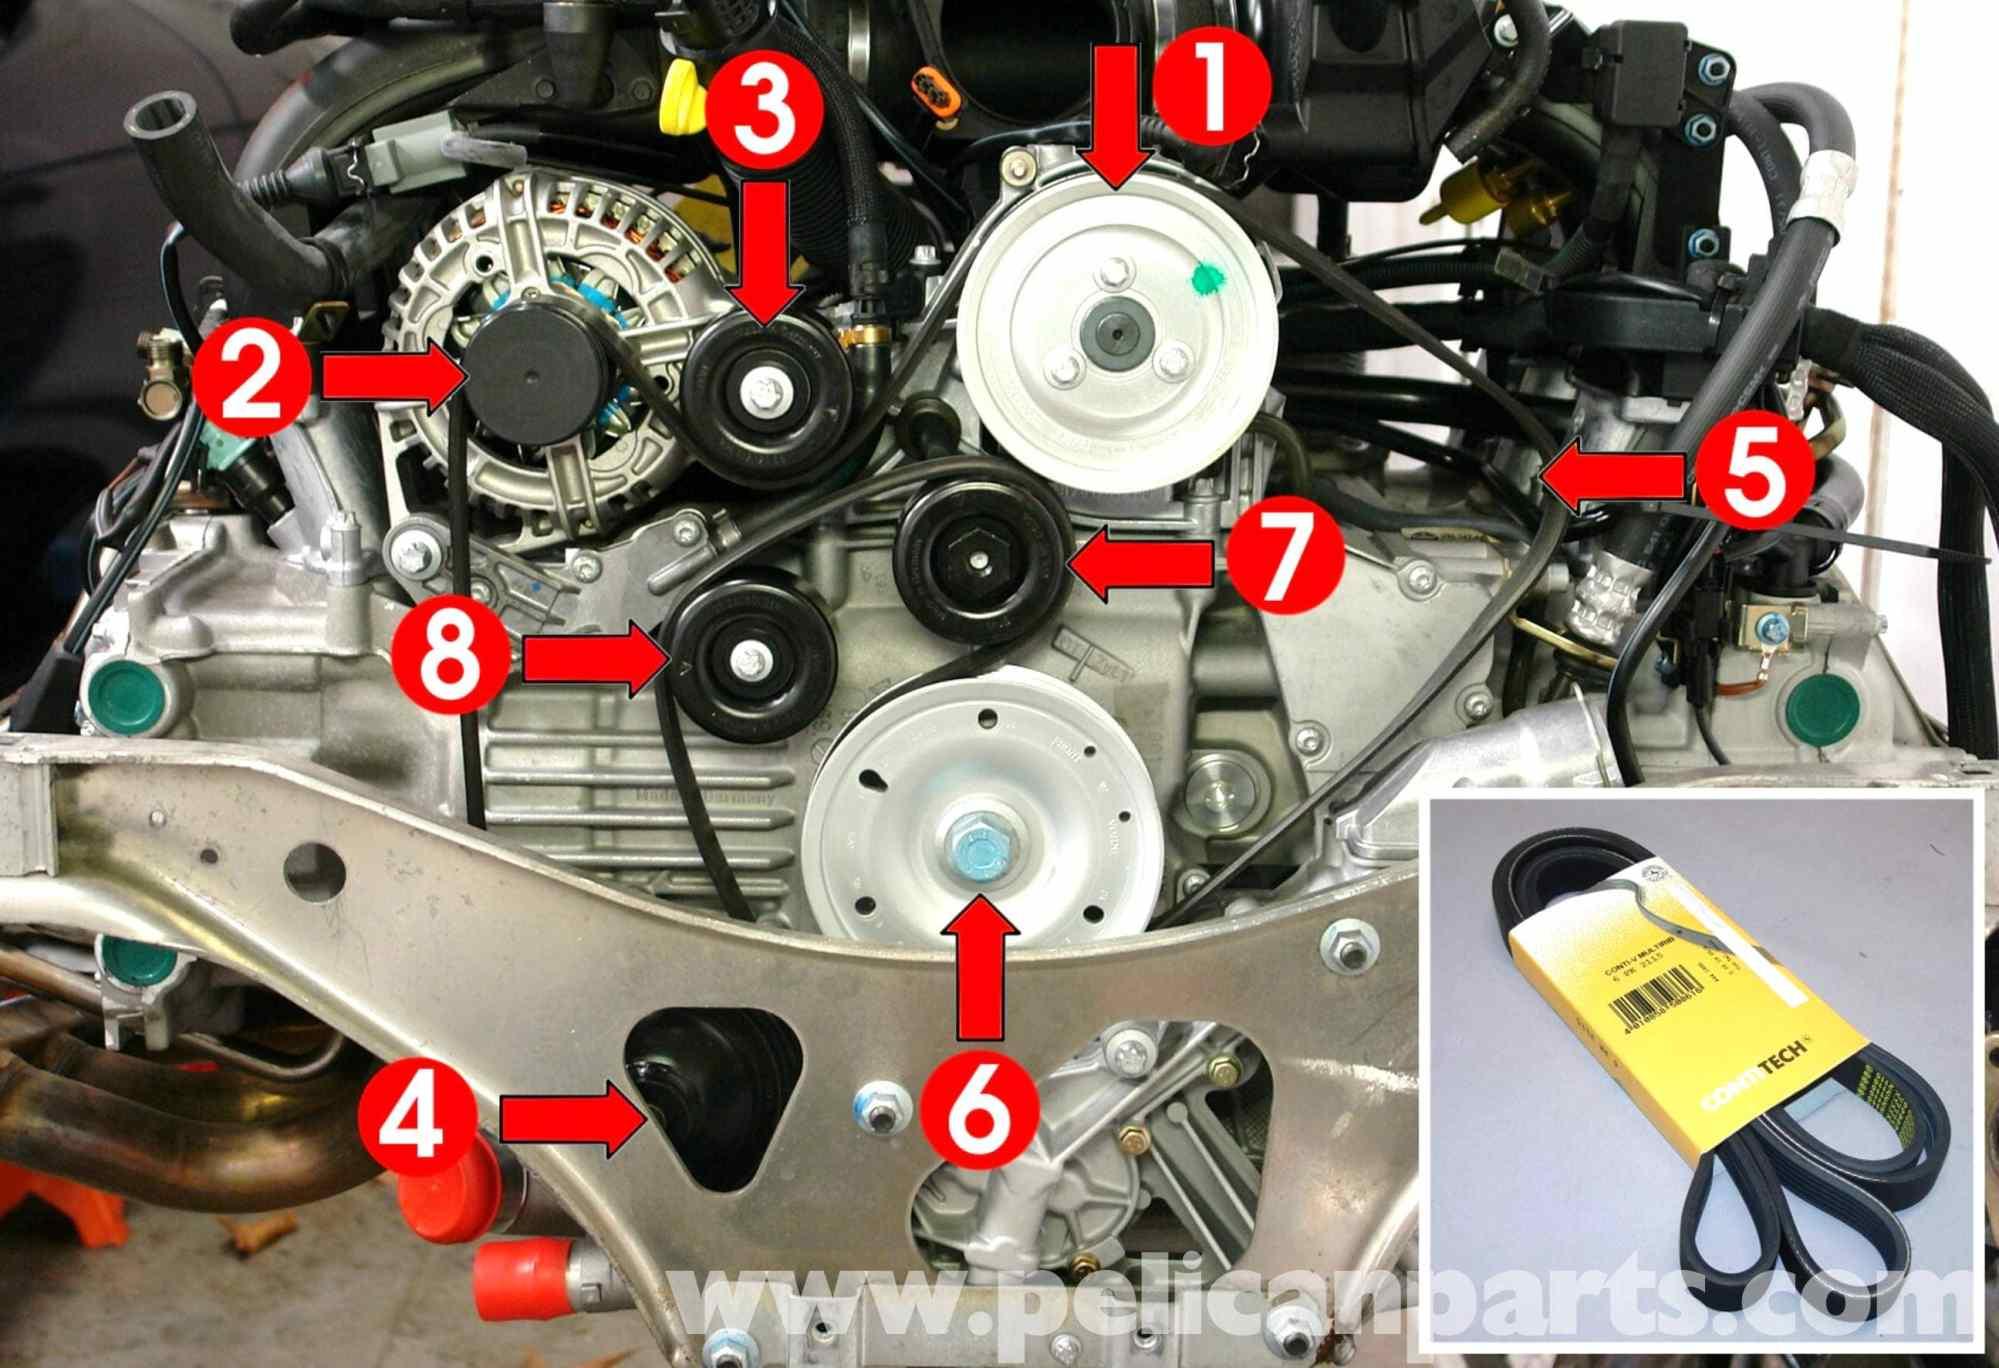 hight resolution of porsche 911 carrera belt replacement 996 1998 2005 2002 nissan 3 5 engine diagram nissan altima 3 5